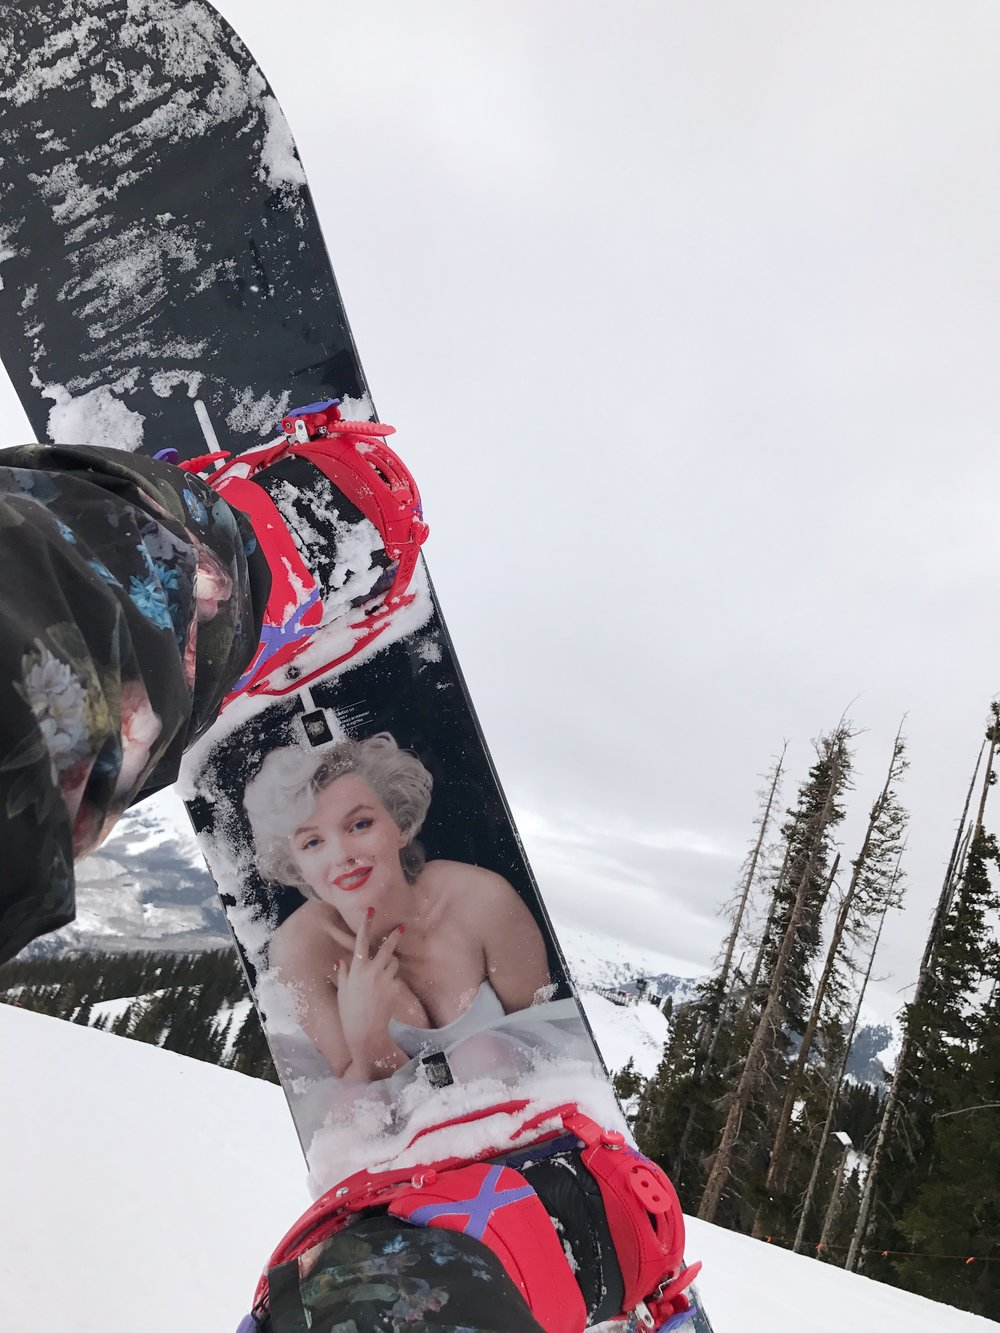 Marilyn Monroe snowboard